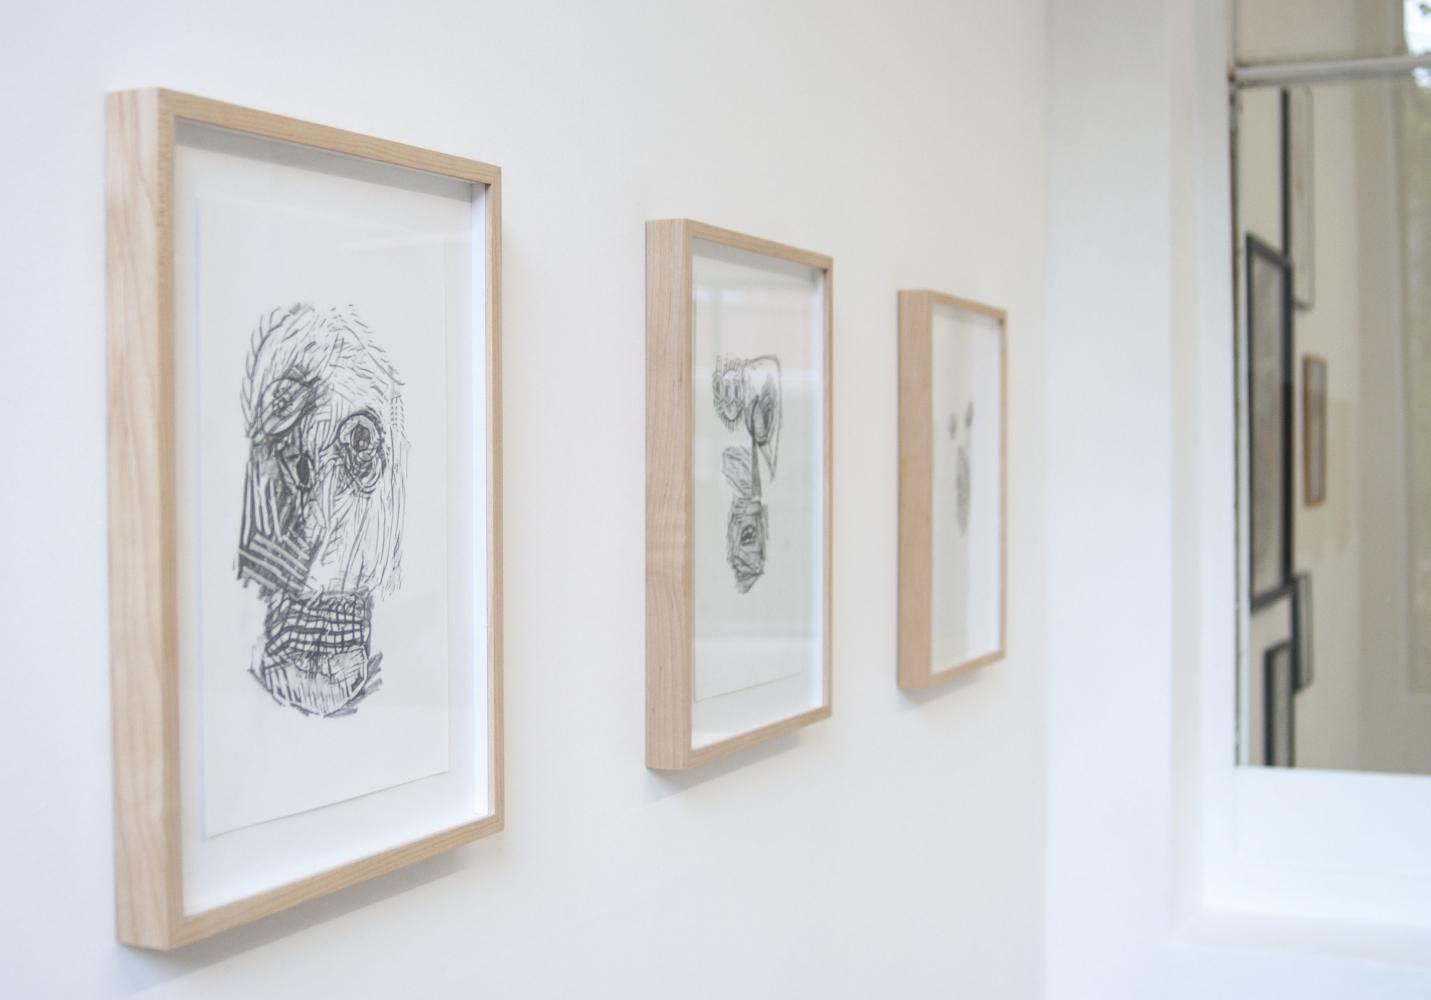 TATJANA gerhard, dmw, dmw art space, false faces